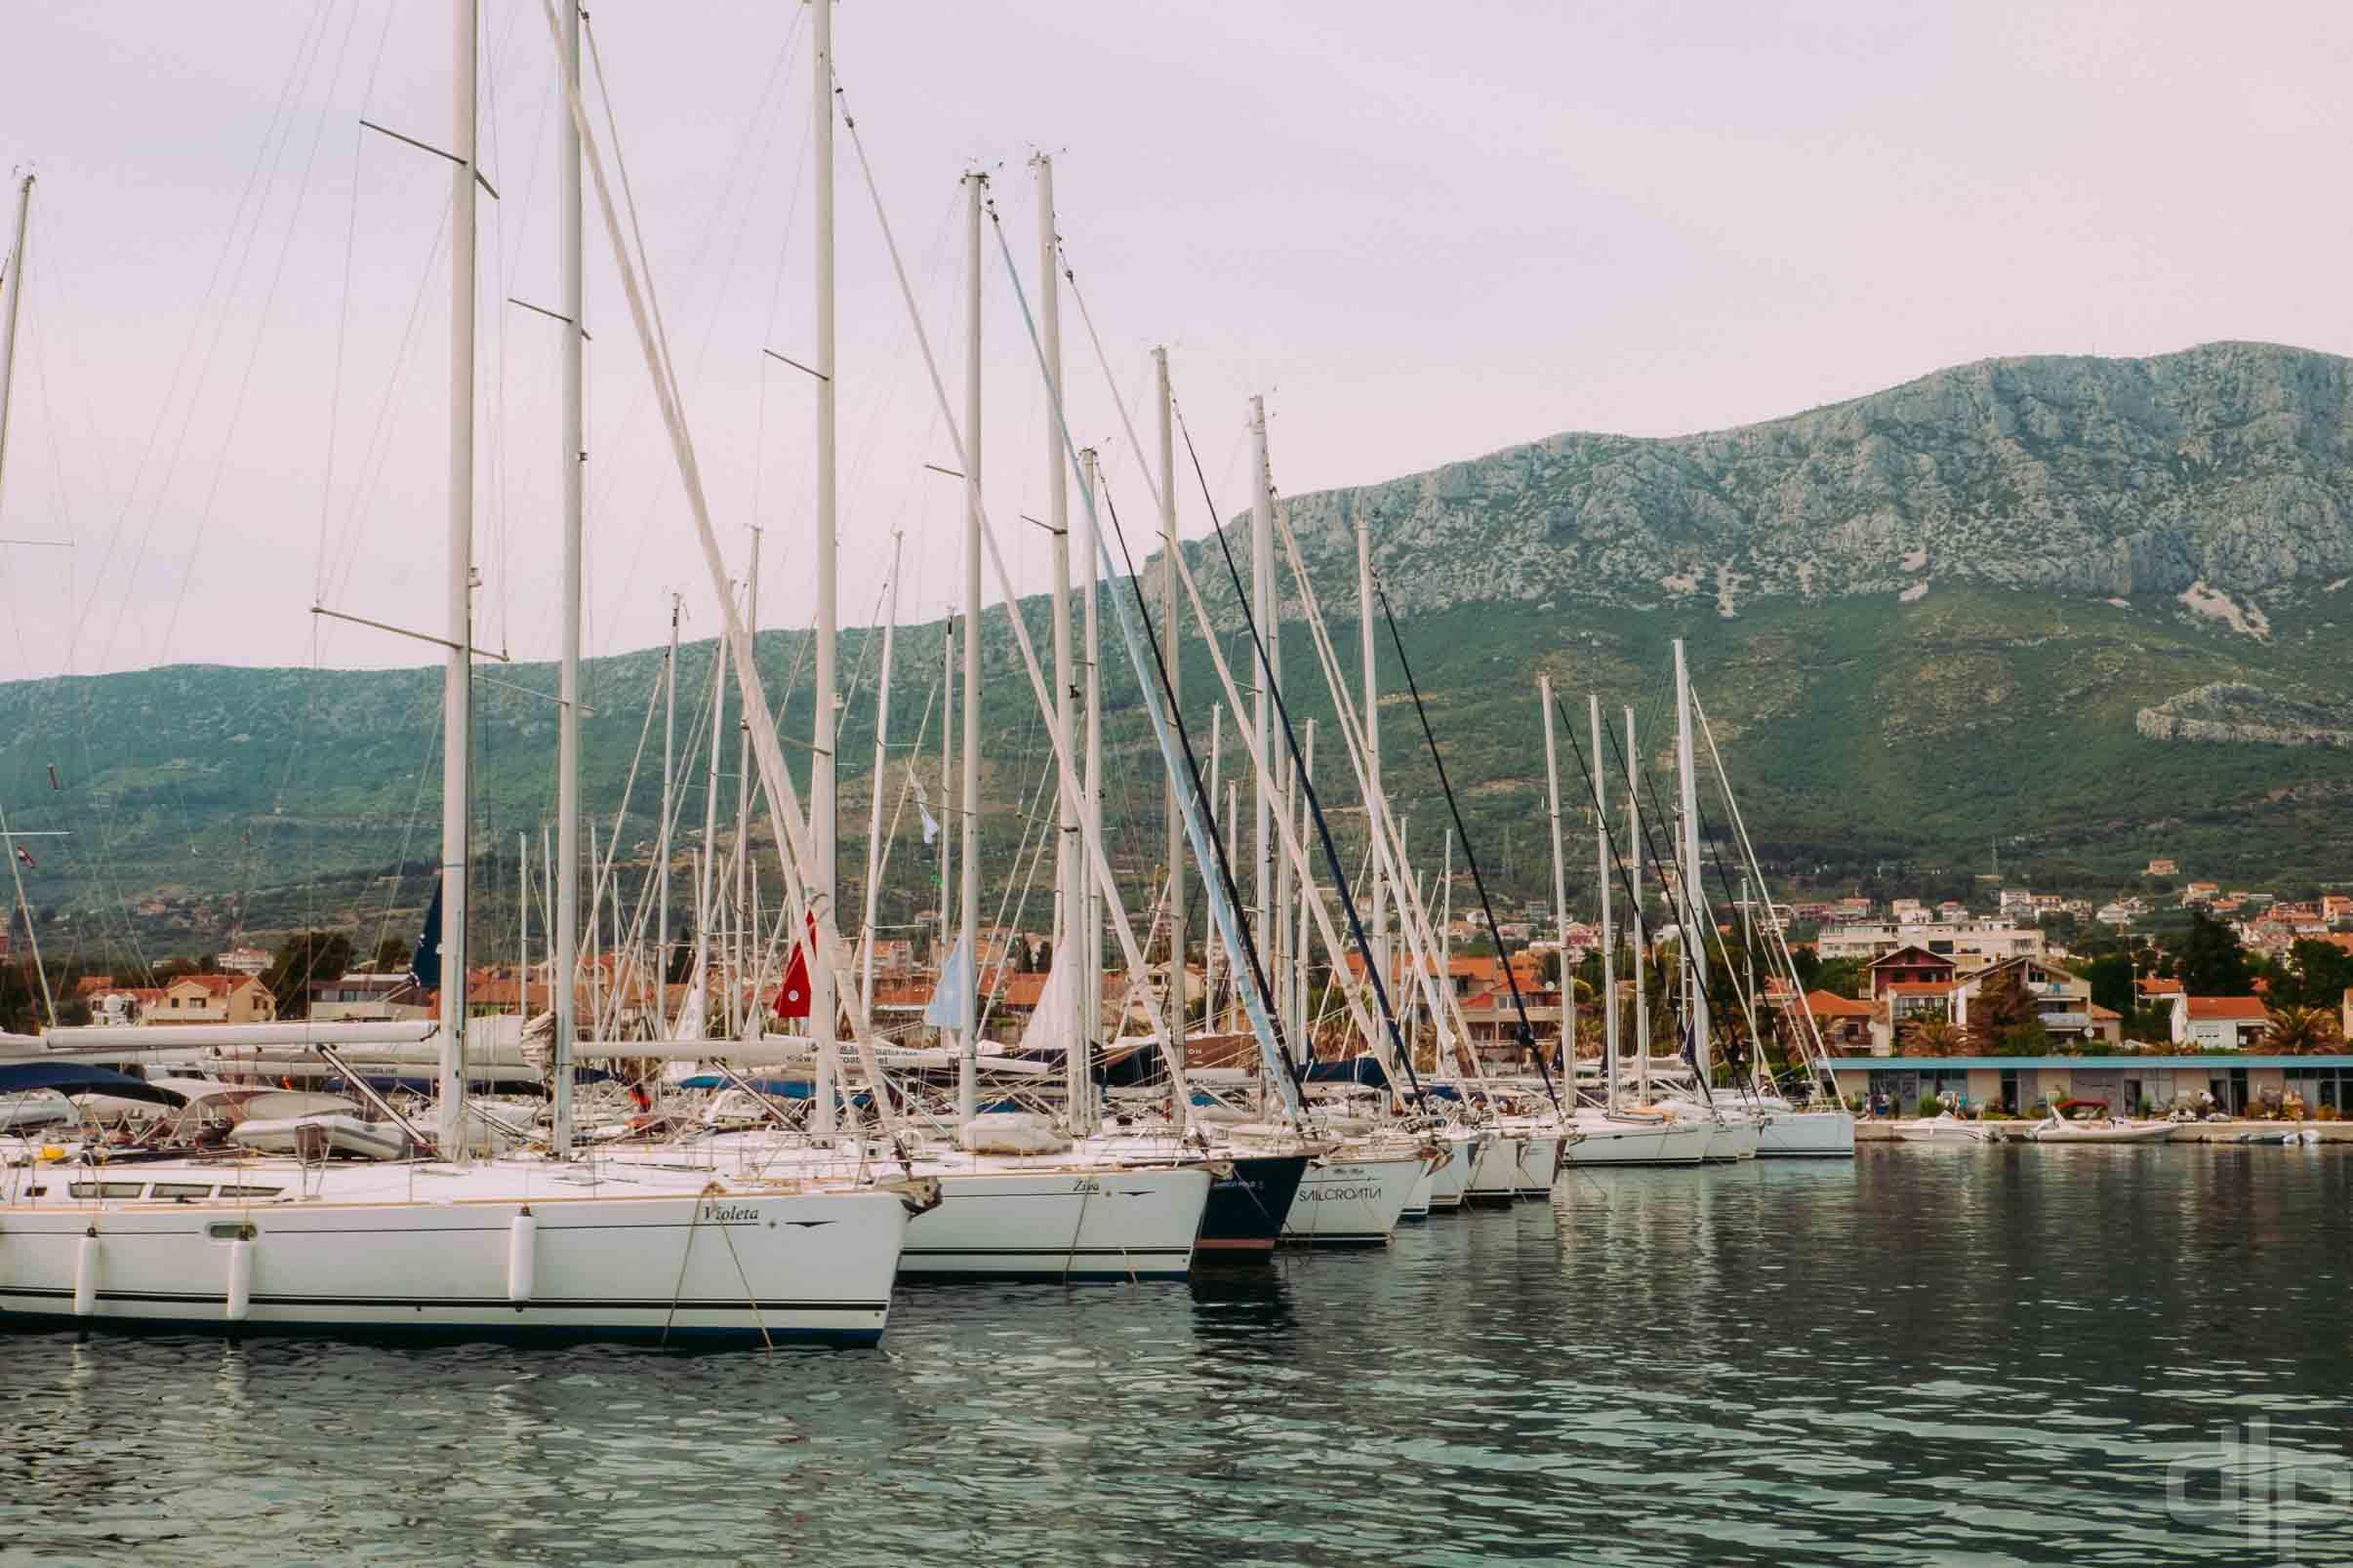 яхты в хорватии фото